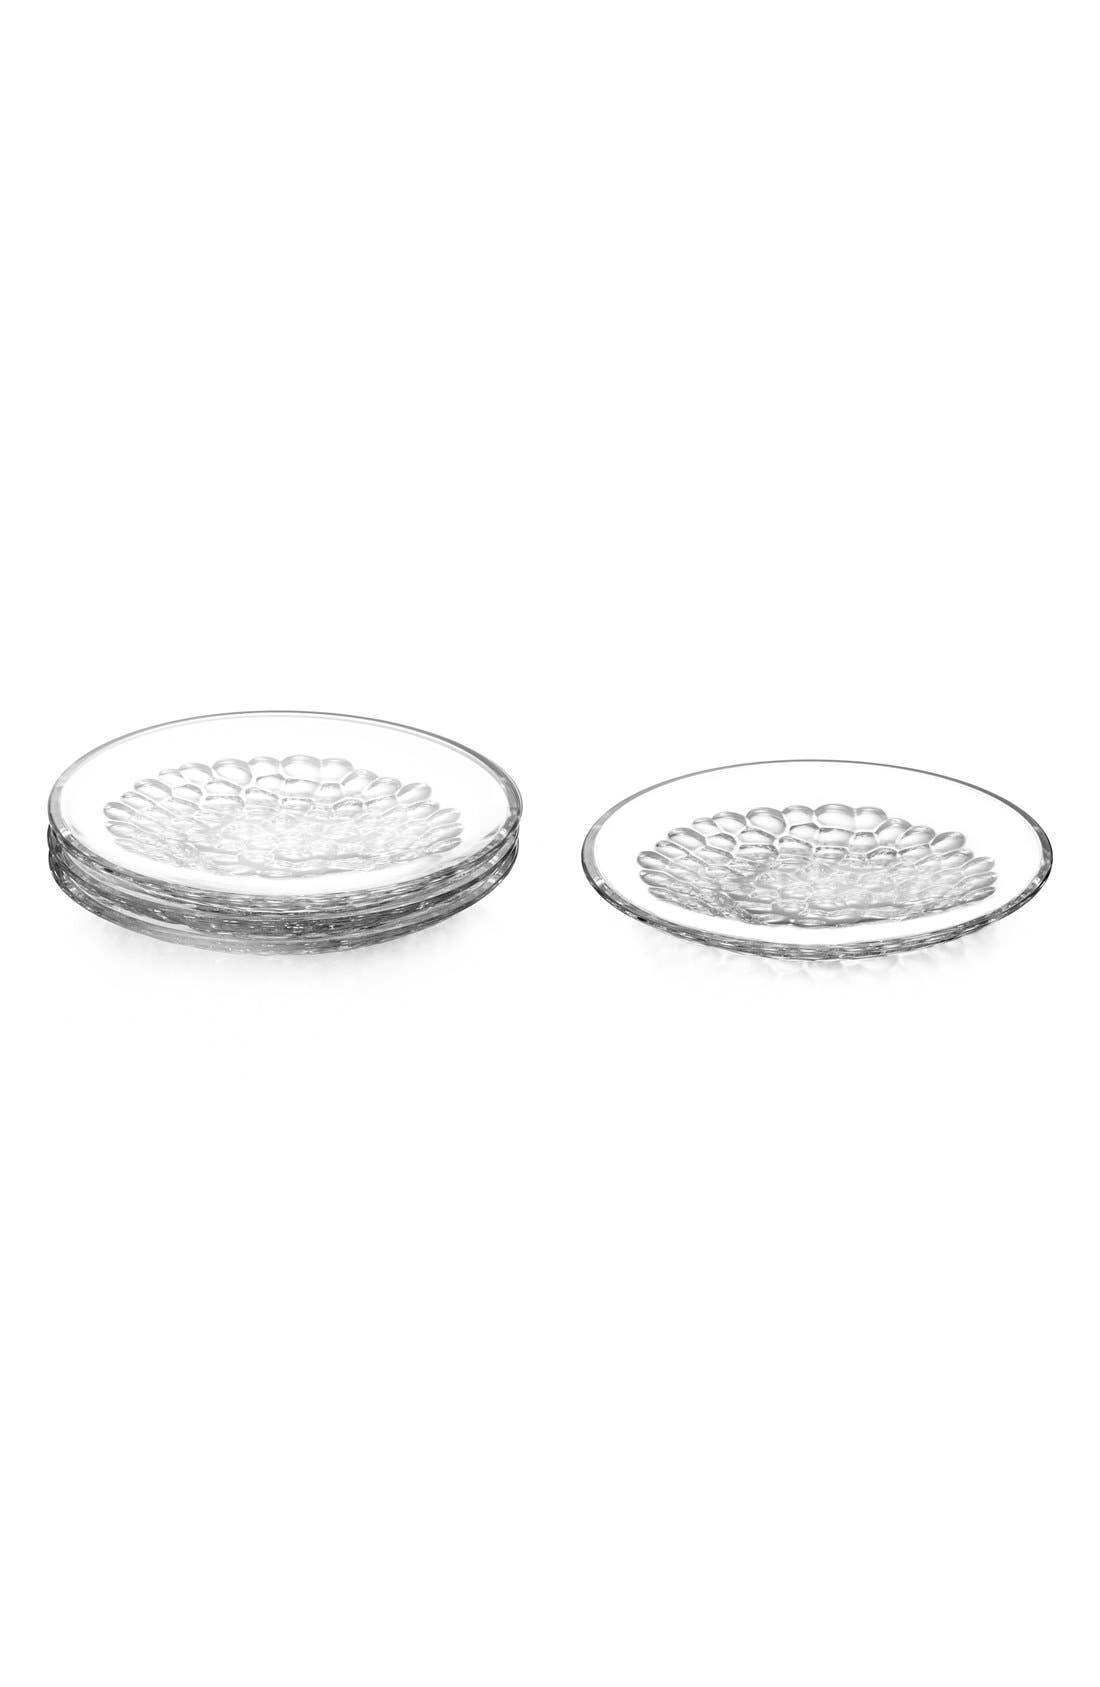 'Pearl' Lead Crystal Dessert Plates,                             Main thumbnail 1, color,                             WHITE